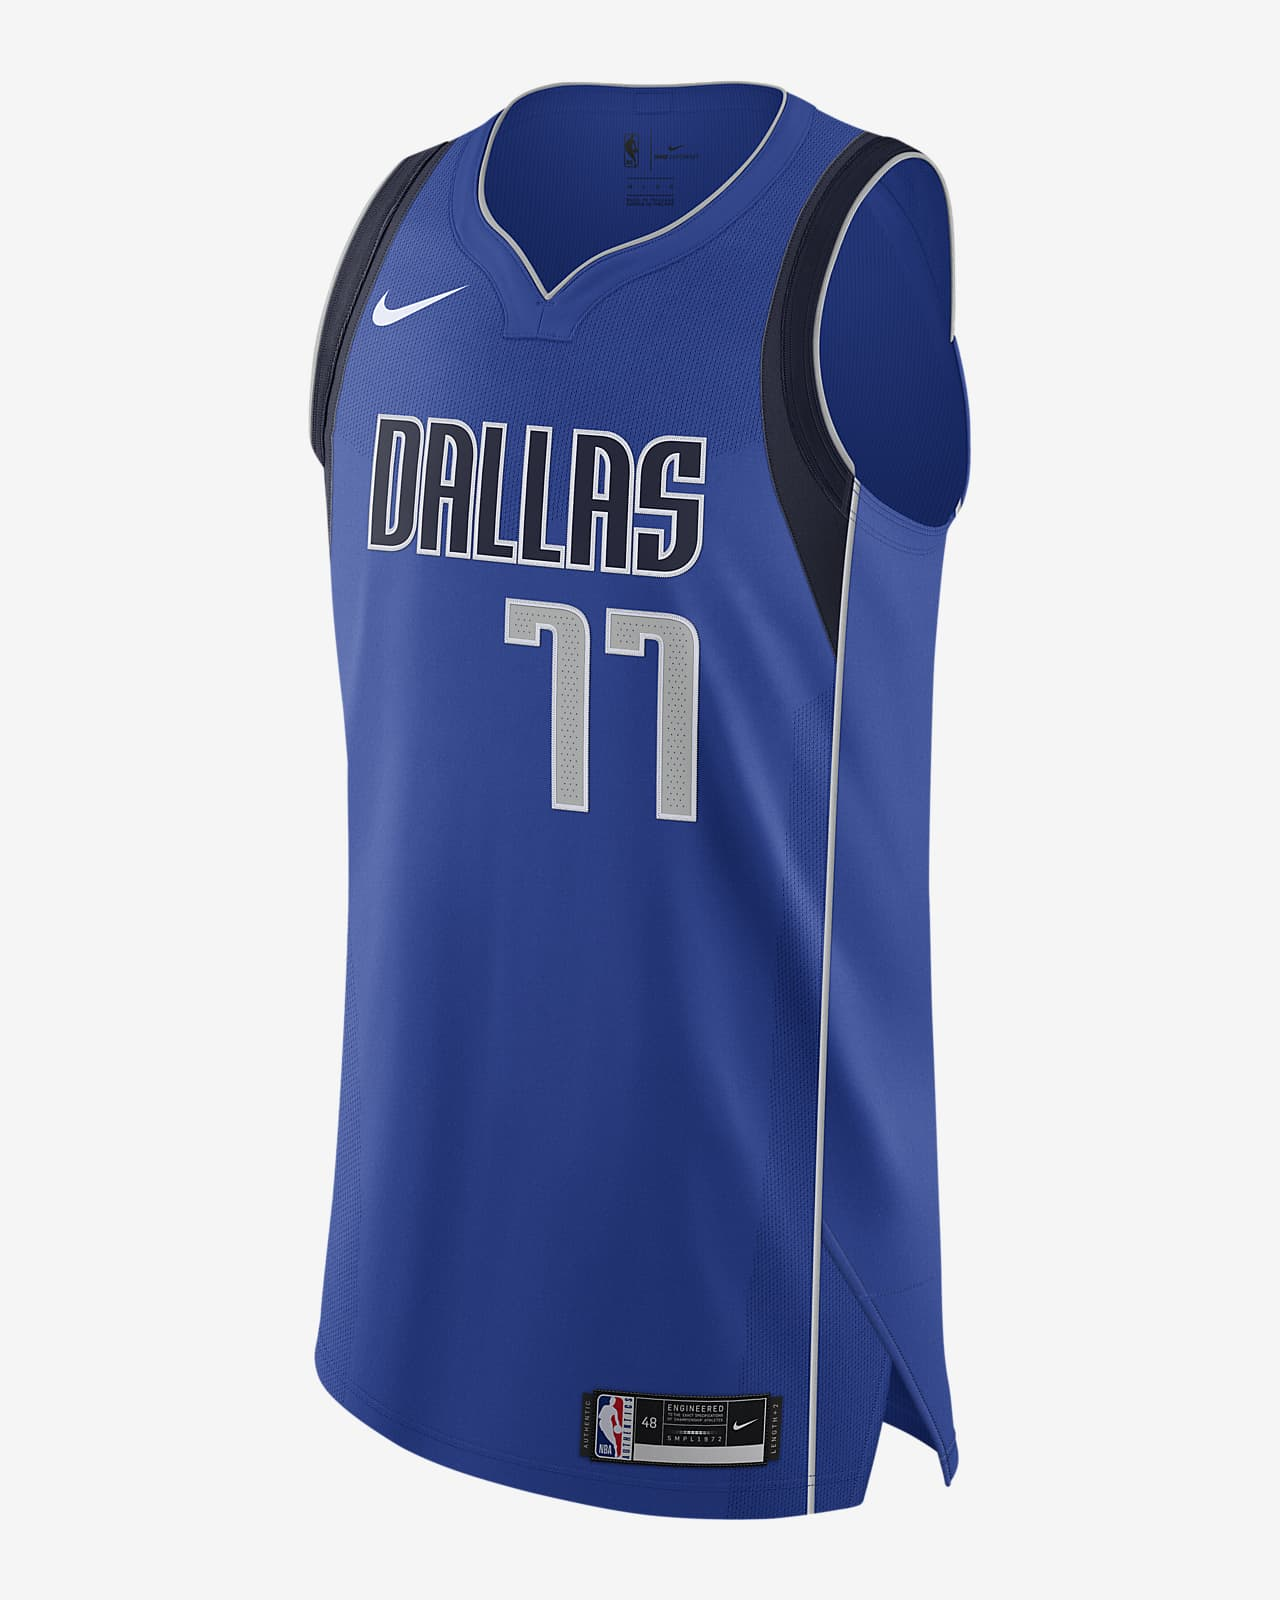 Luka Doncic Mavericks Icon Edition 2020 Nike NBA Authentic Jersey